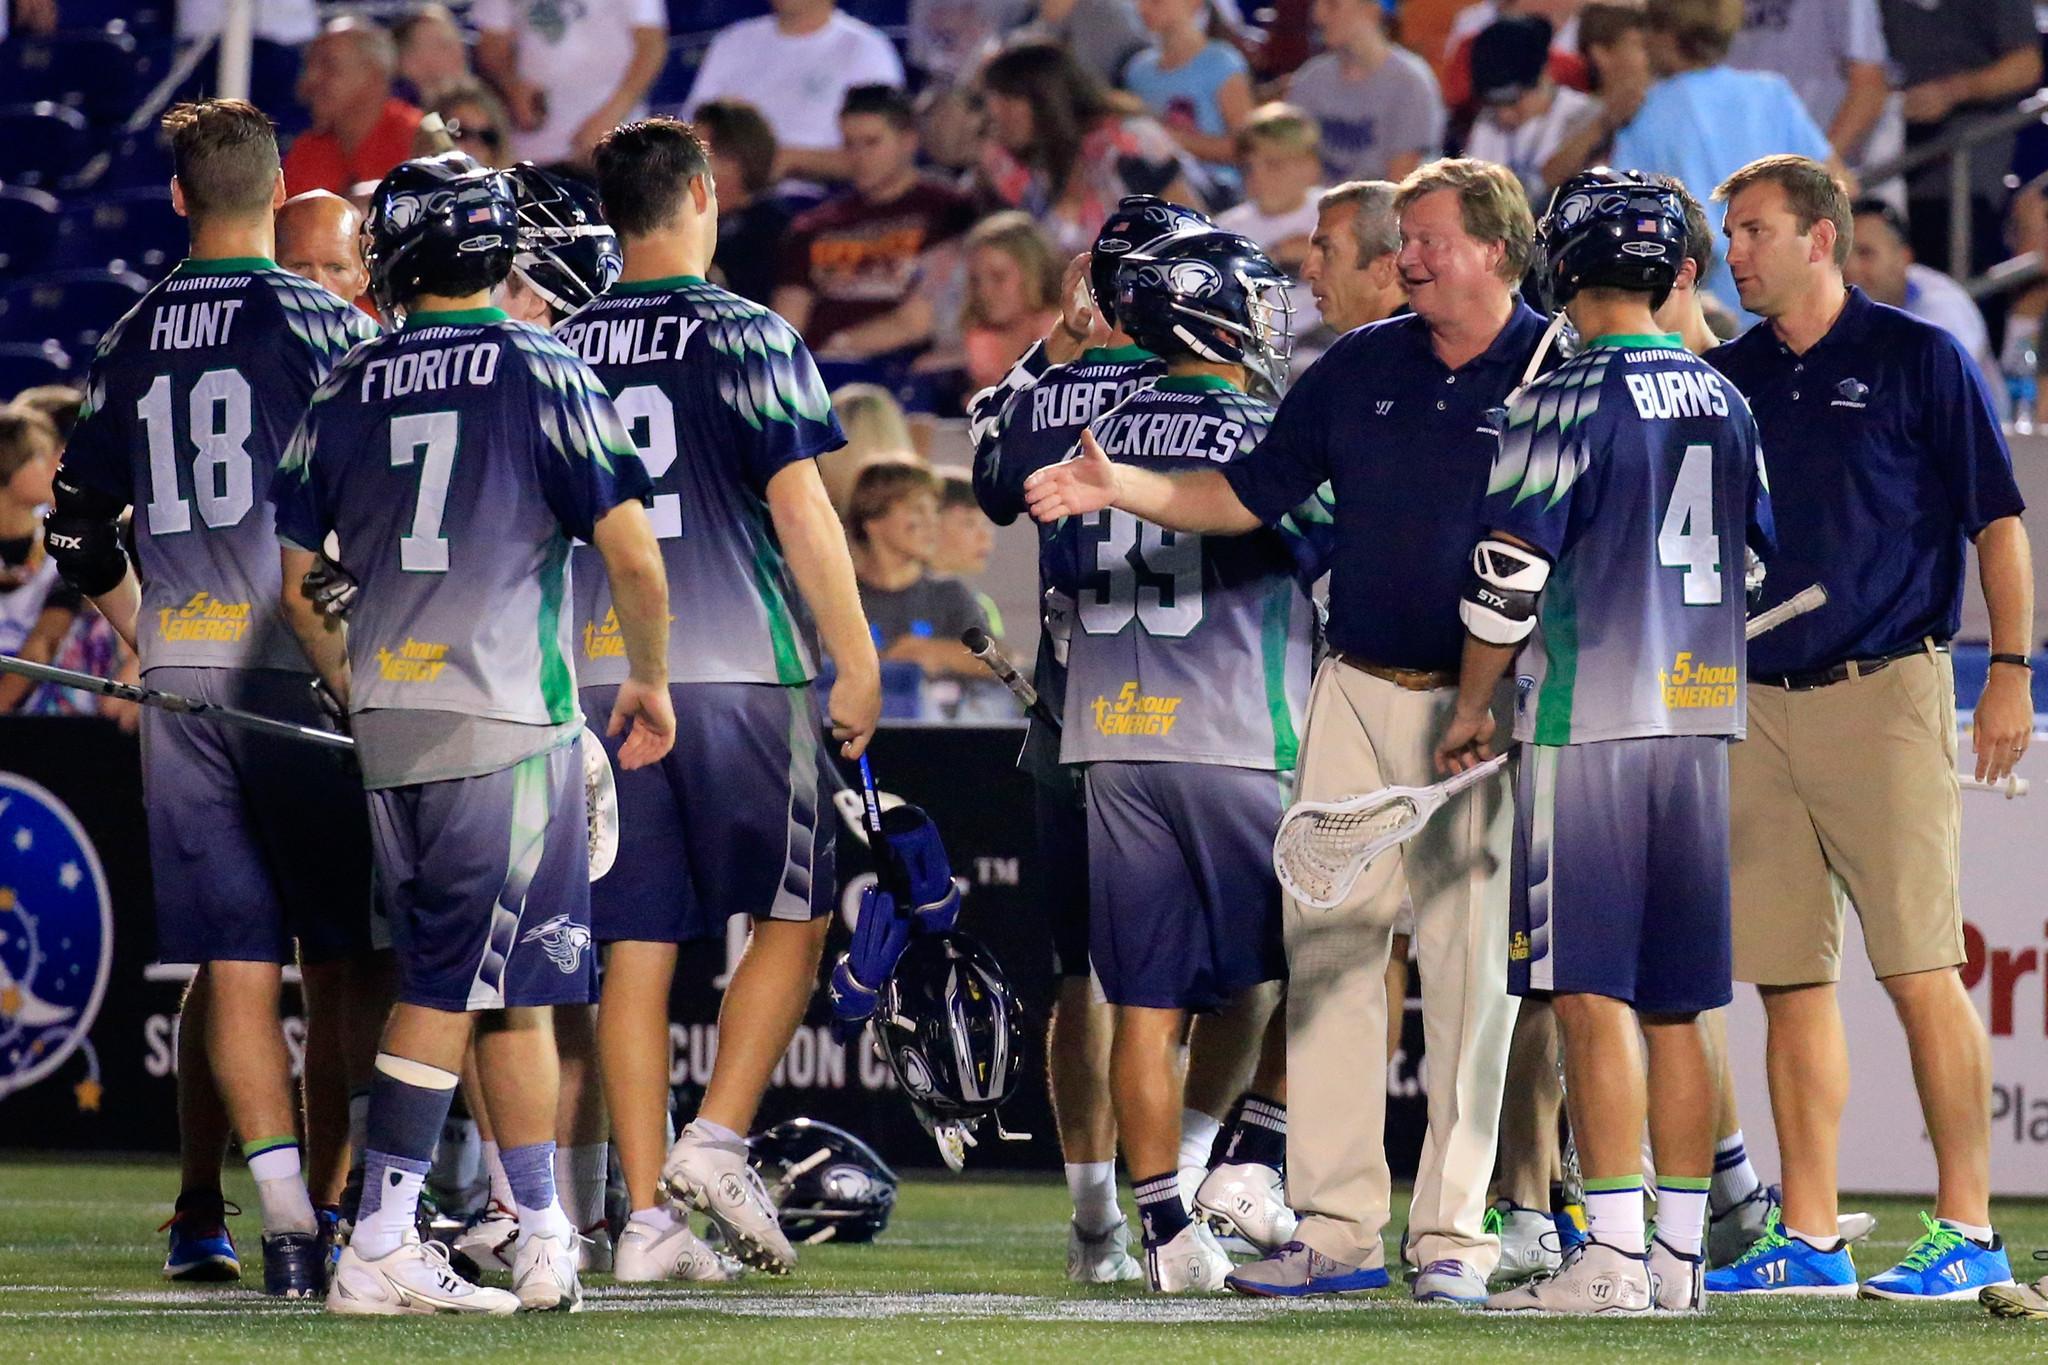 2014 Chesapeake Bayhawks pictures - Baltimore Sun